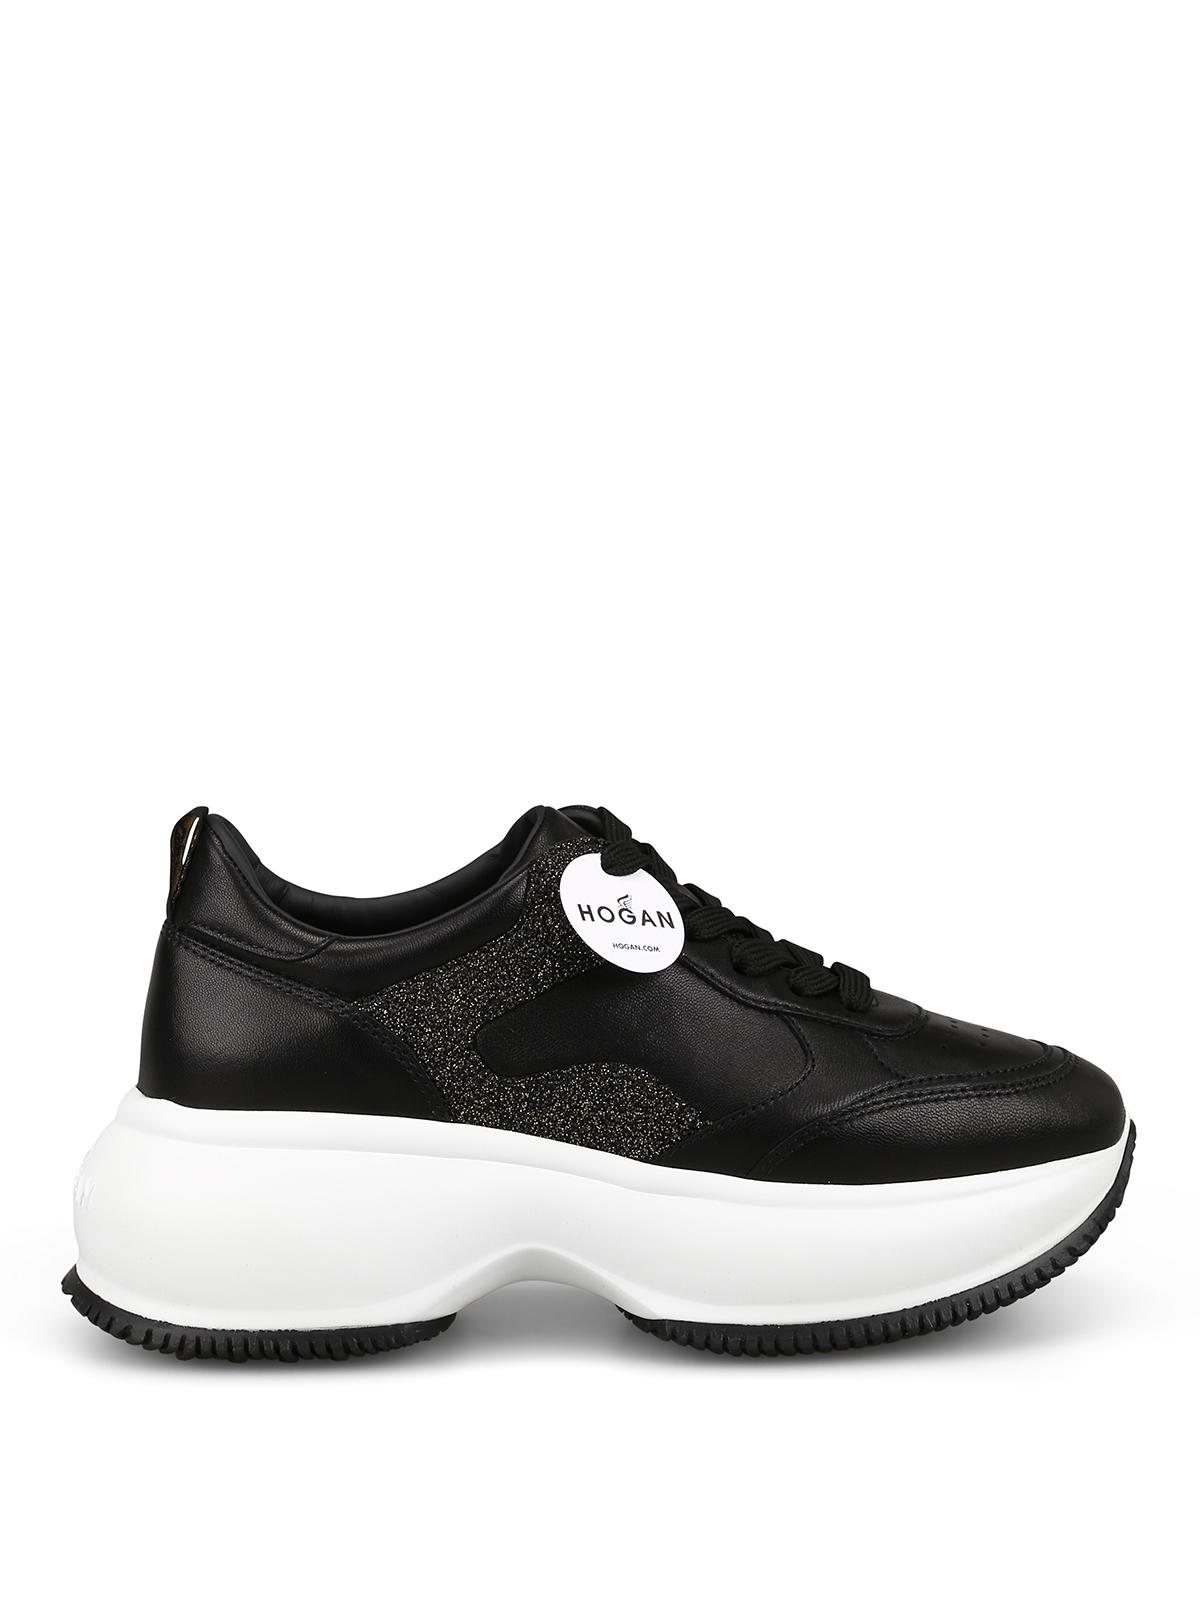 Trainers Hogan - Maxi I Active black glitter sneakers ...